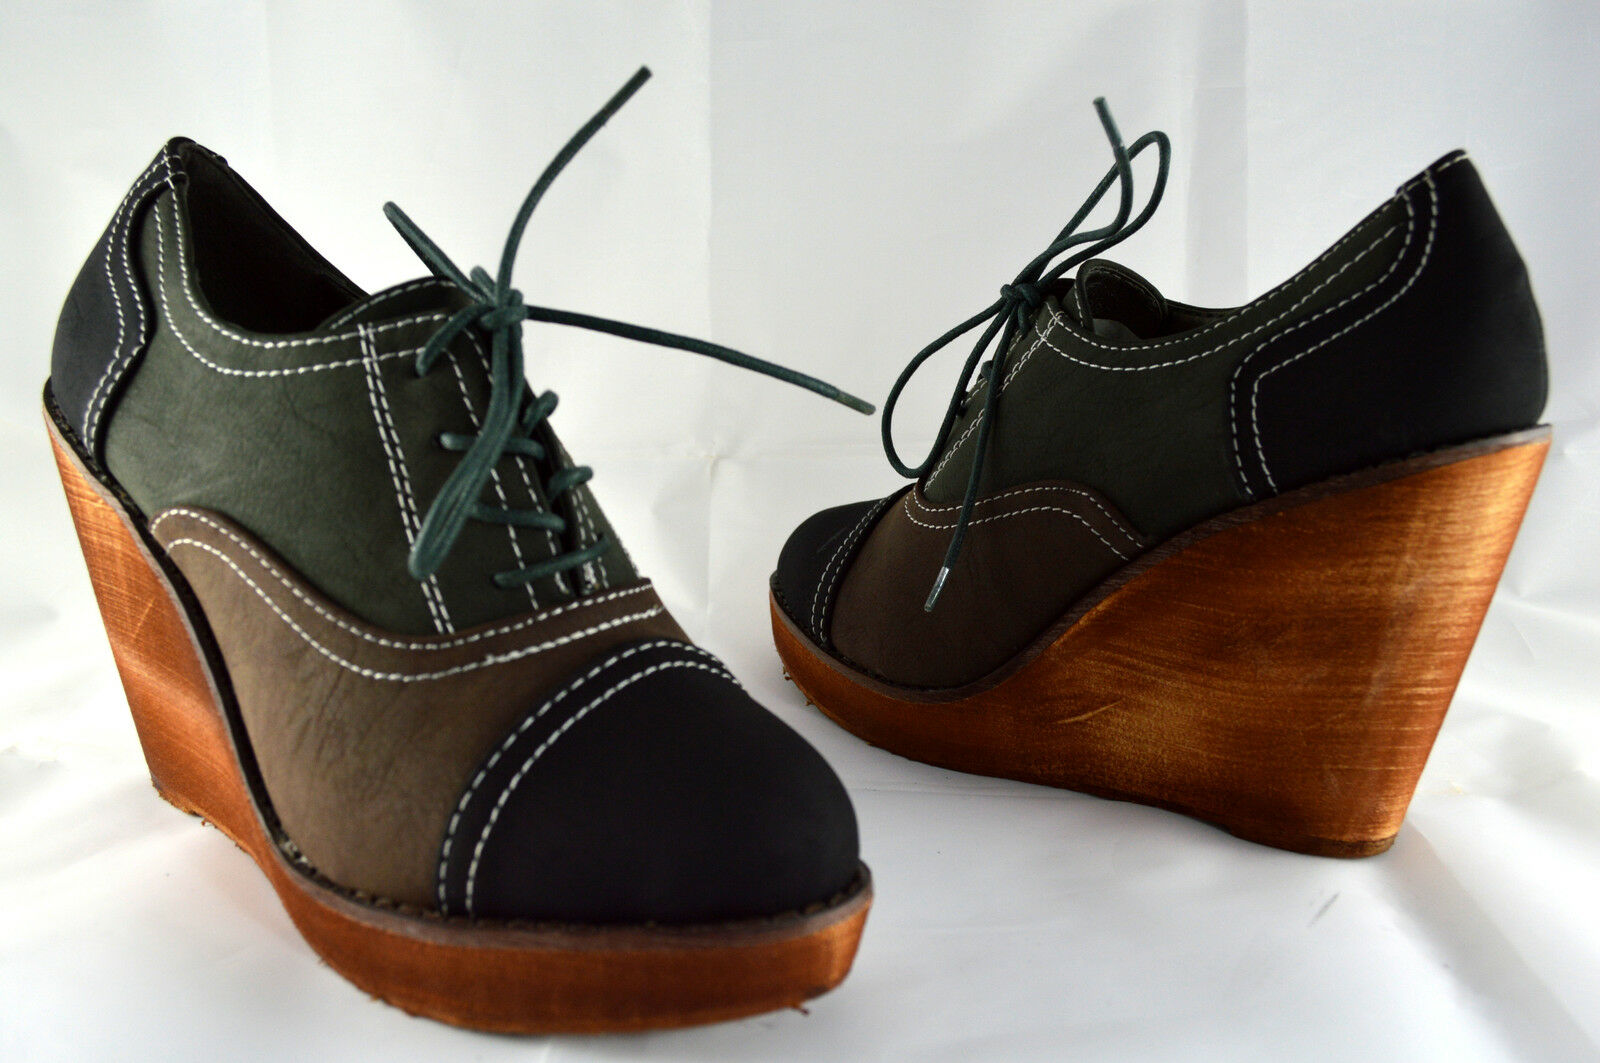 Keilabsatz Damen Schuhe Stiefeletten Wedge Sneaker Boots G36-41 Schwarz A.0103